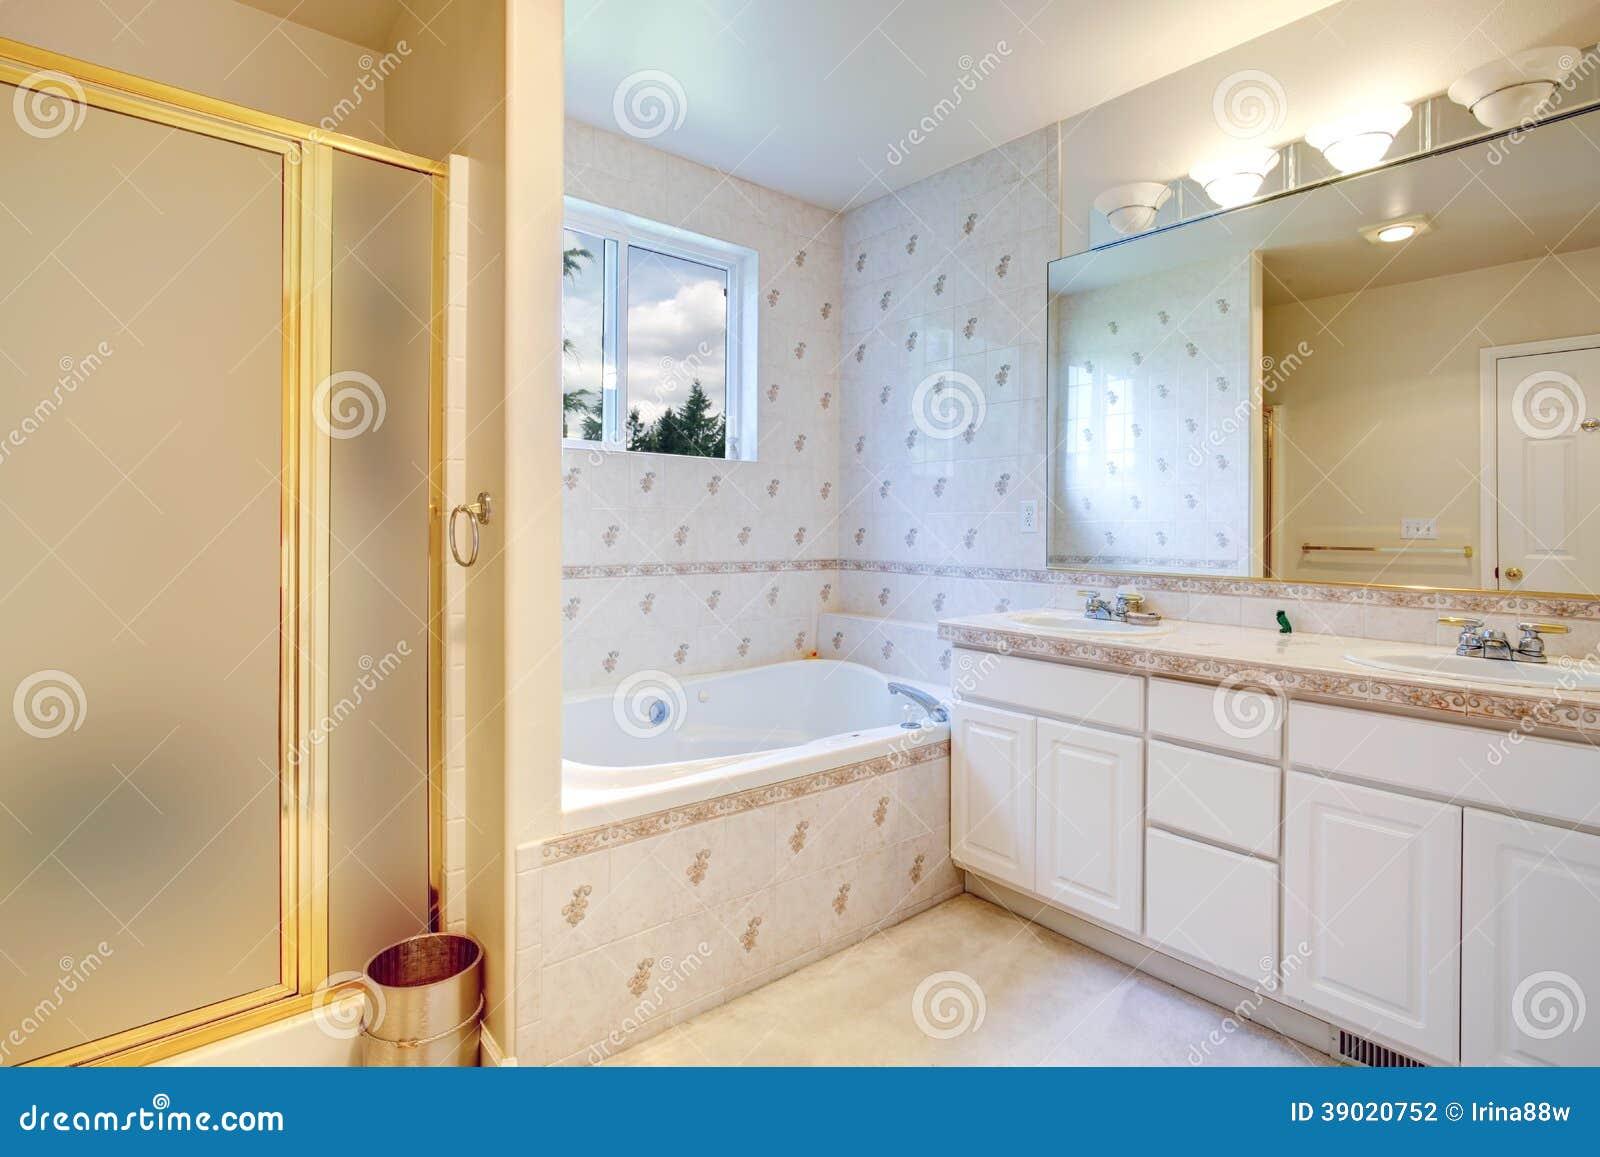 Dipingere le piastrelle del bagno fai da te beautiful idee